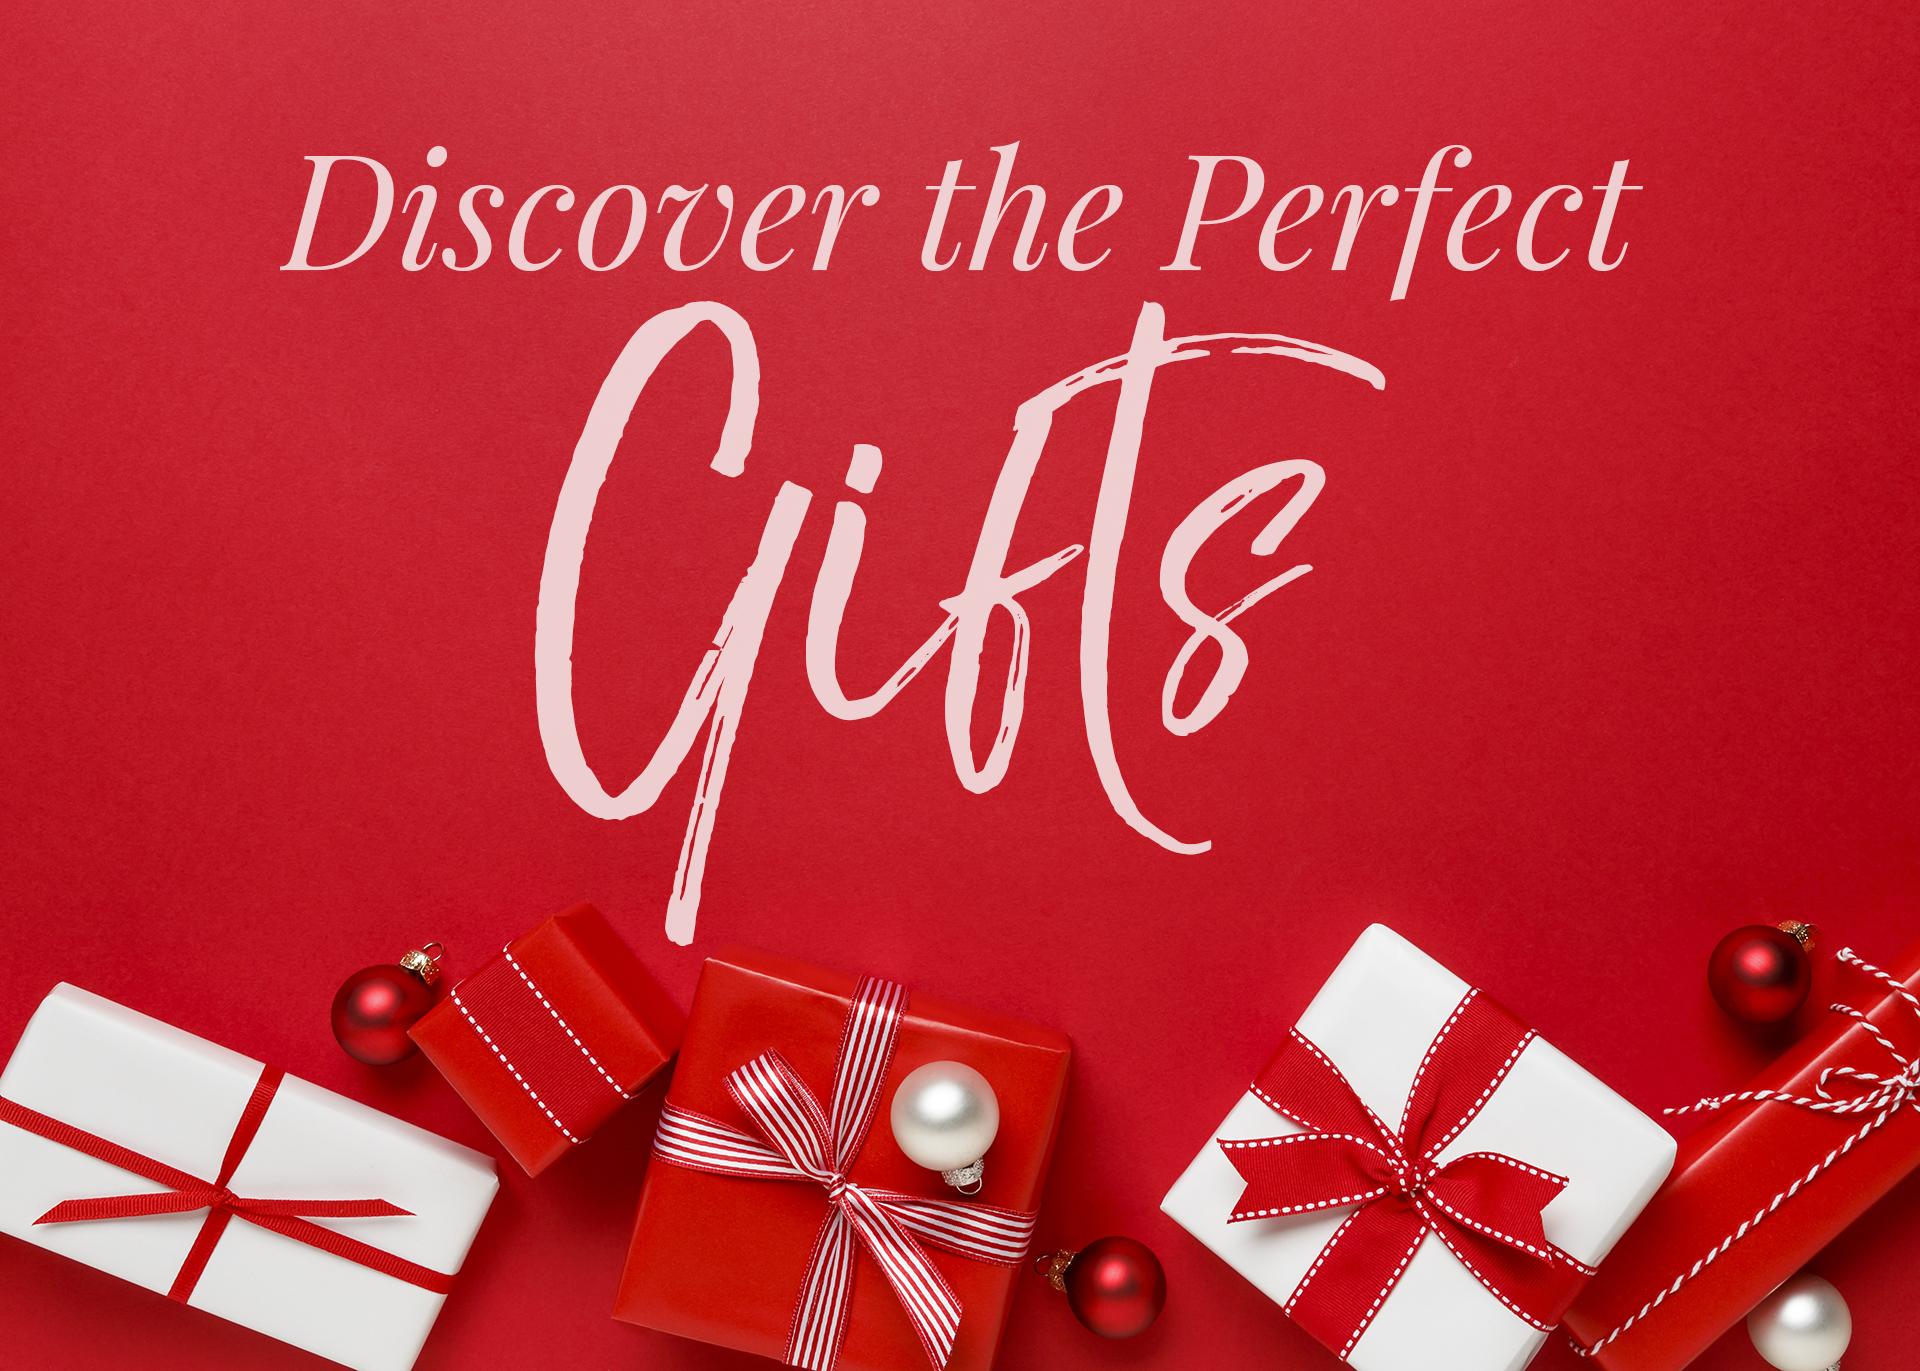 gifts-banner-xl-001.jpg